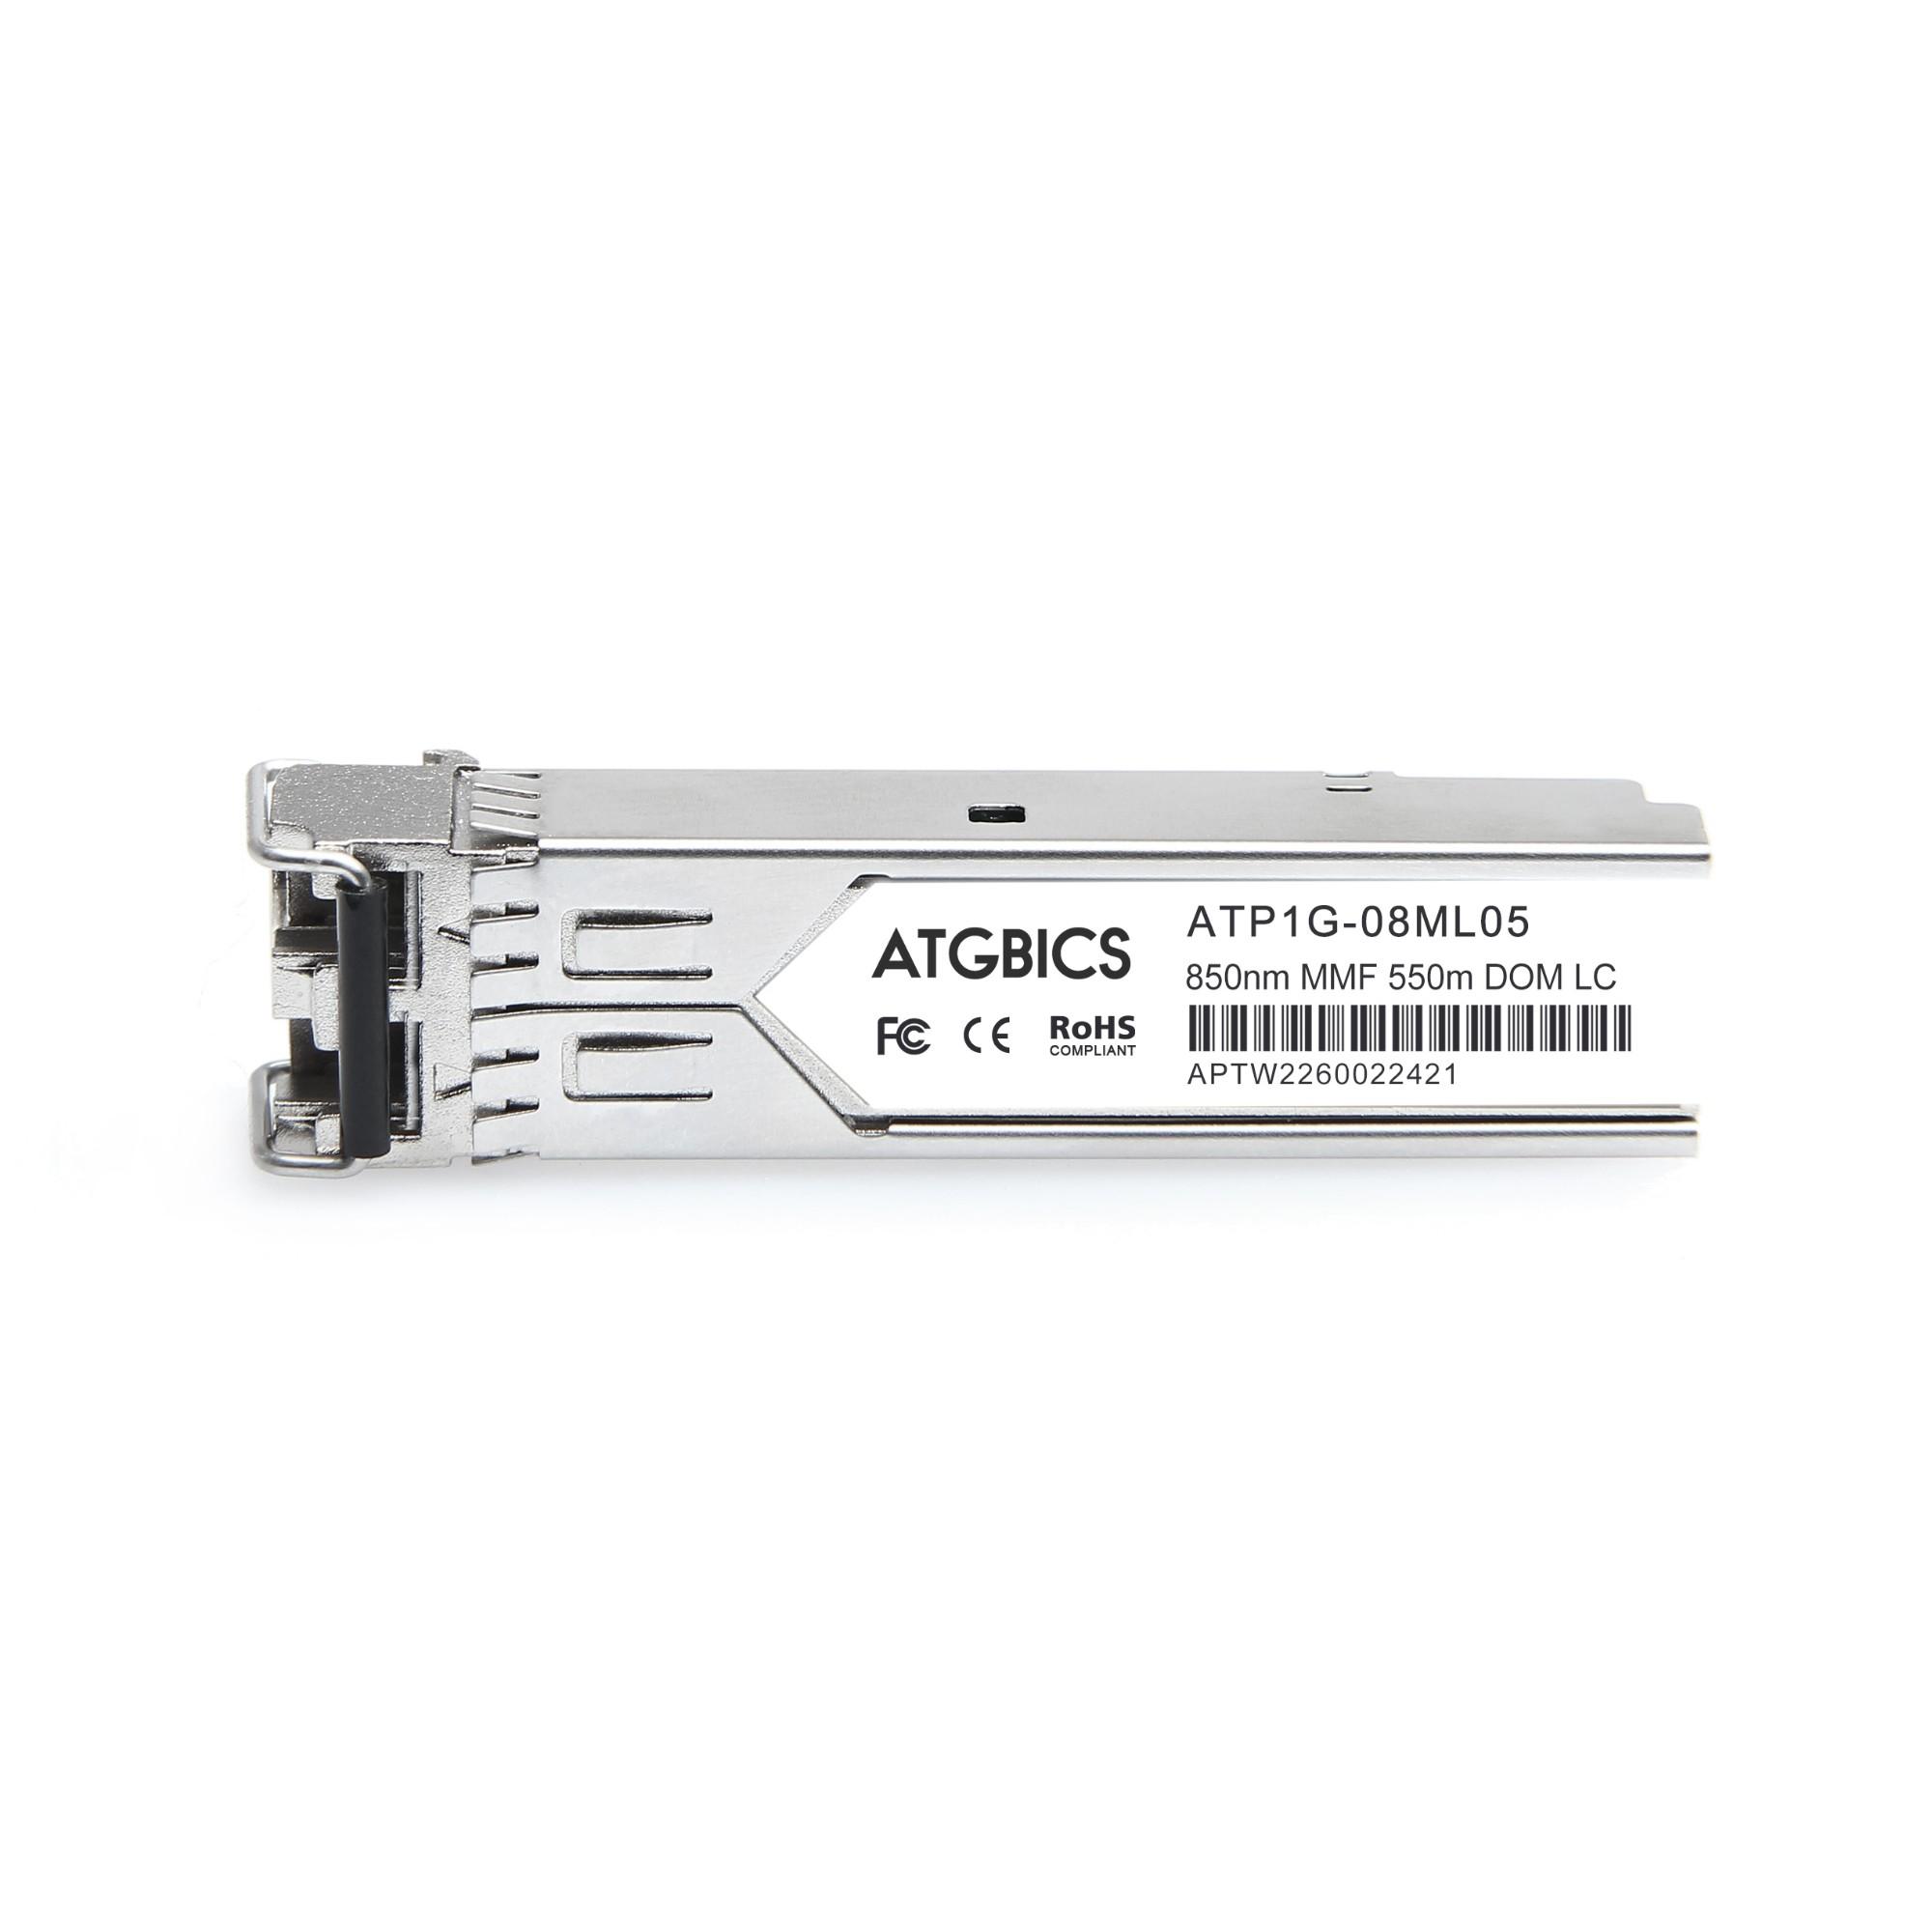 Image of ATGBICS T8-3200-C network transceiver module Fiber optic 1000 Mbit/s SFP 850 nm